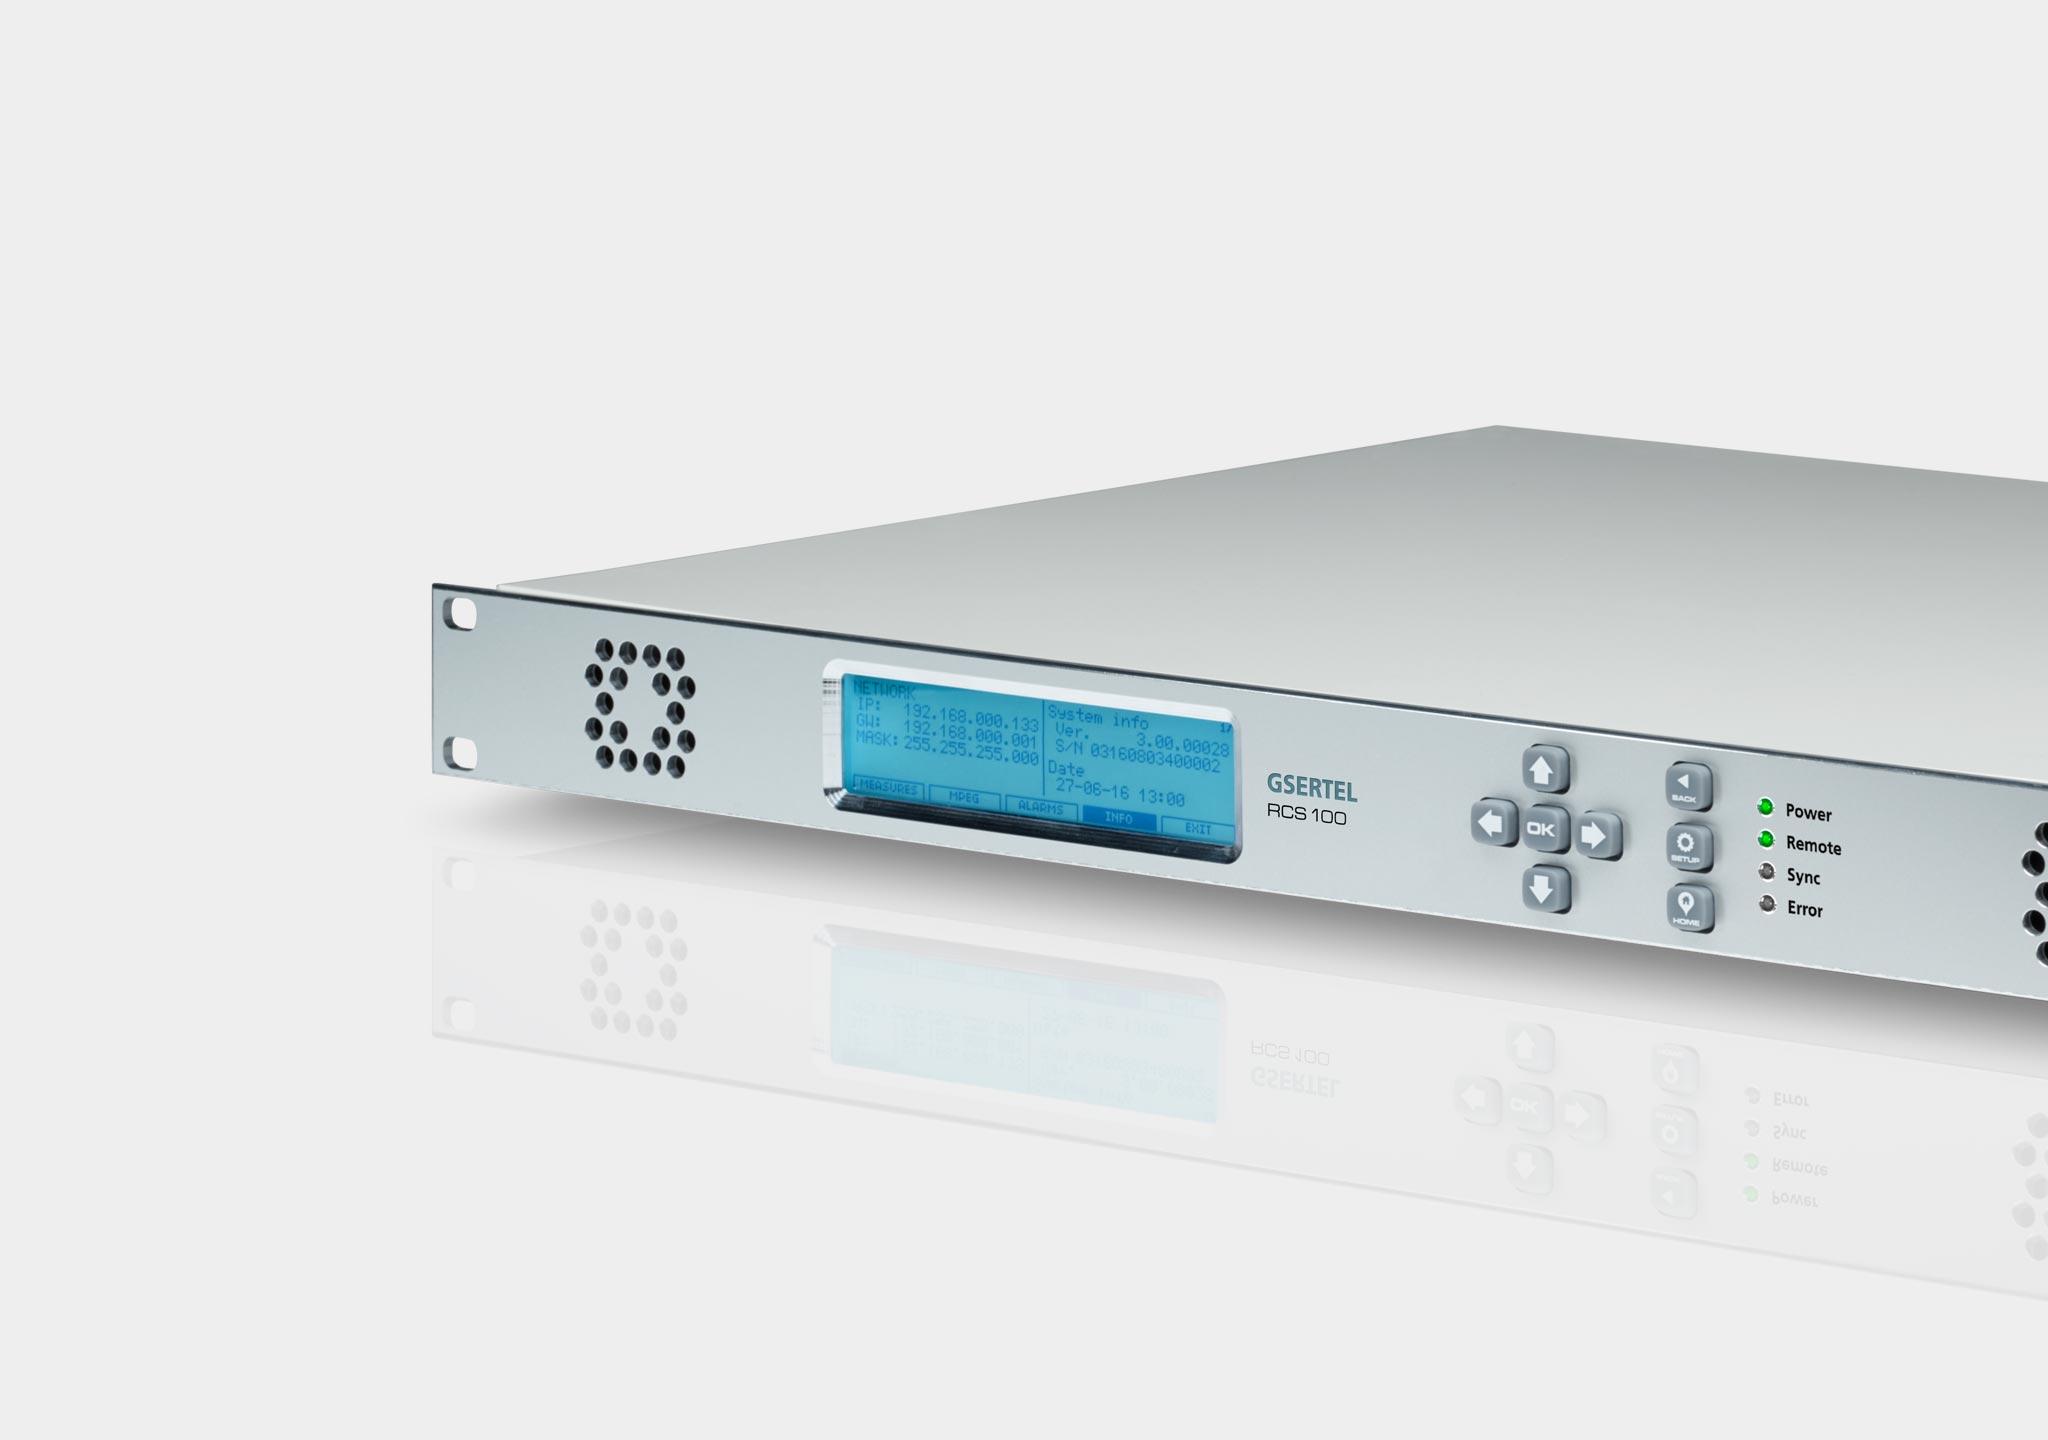 RCS 100 DVB-T/T2: Remote digital TV signal monitoring - Gsertel